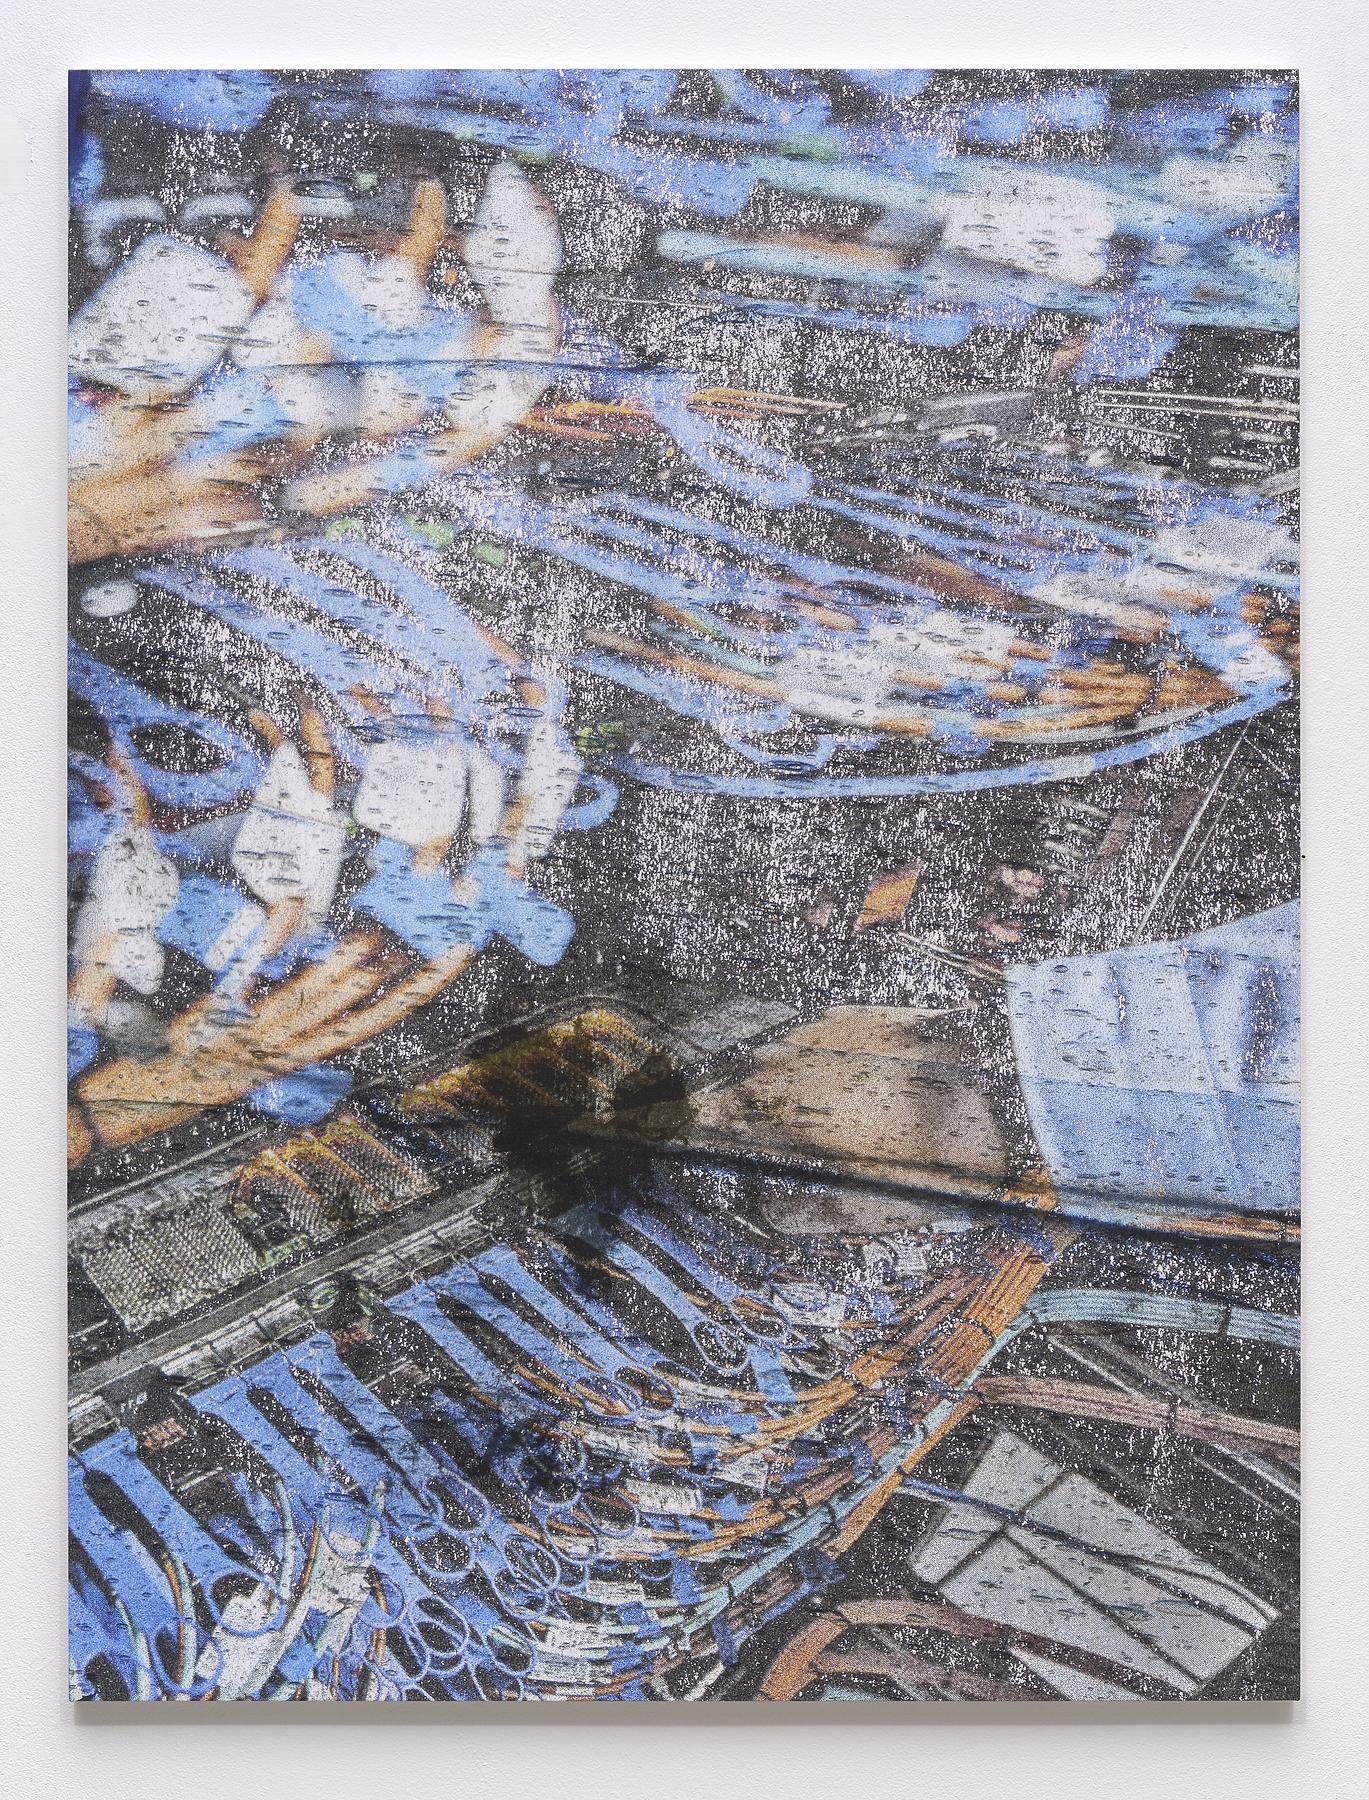 Hugh Scott-Douglas,  Untitled , 2018, UV cured inkjet print, digitally printed polyester resin on dibond, 53 x 40 inches